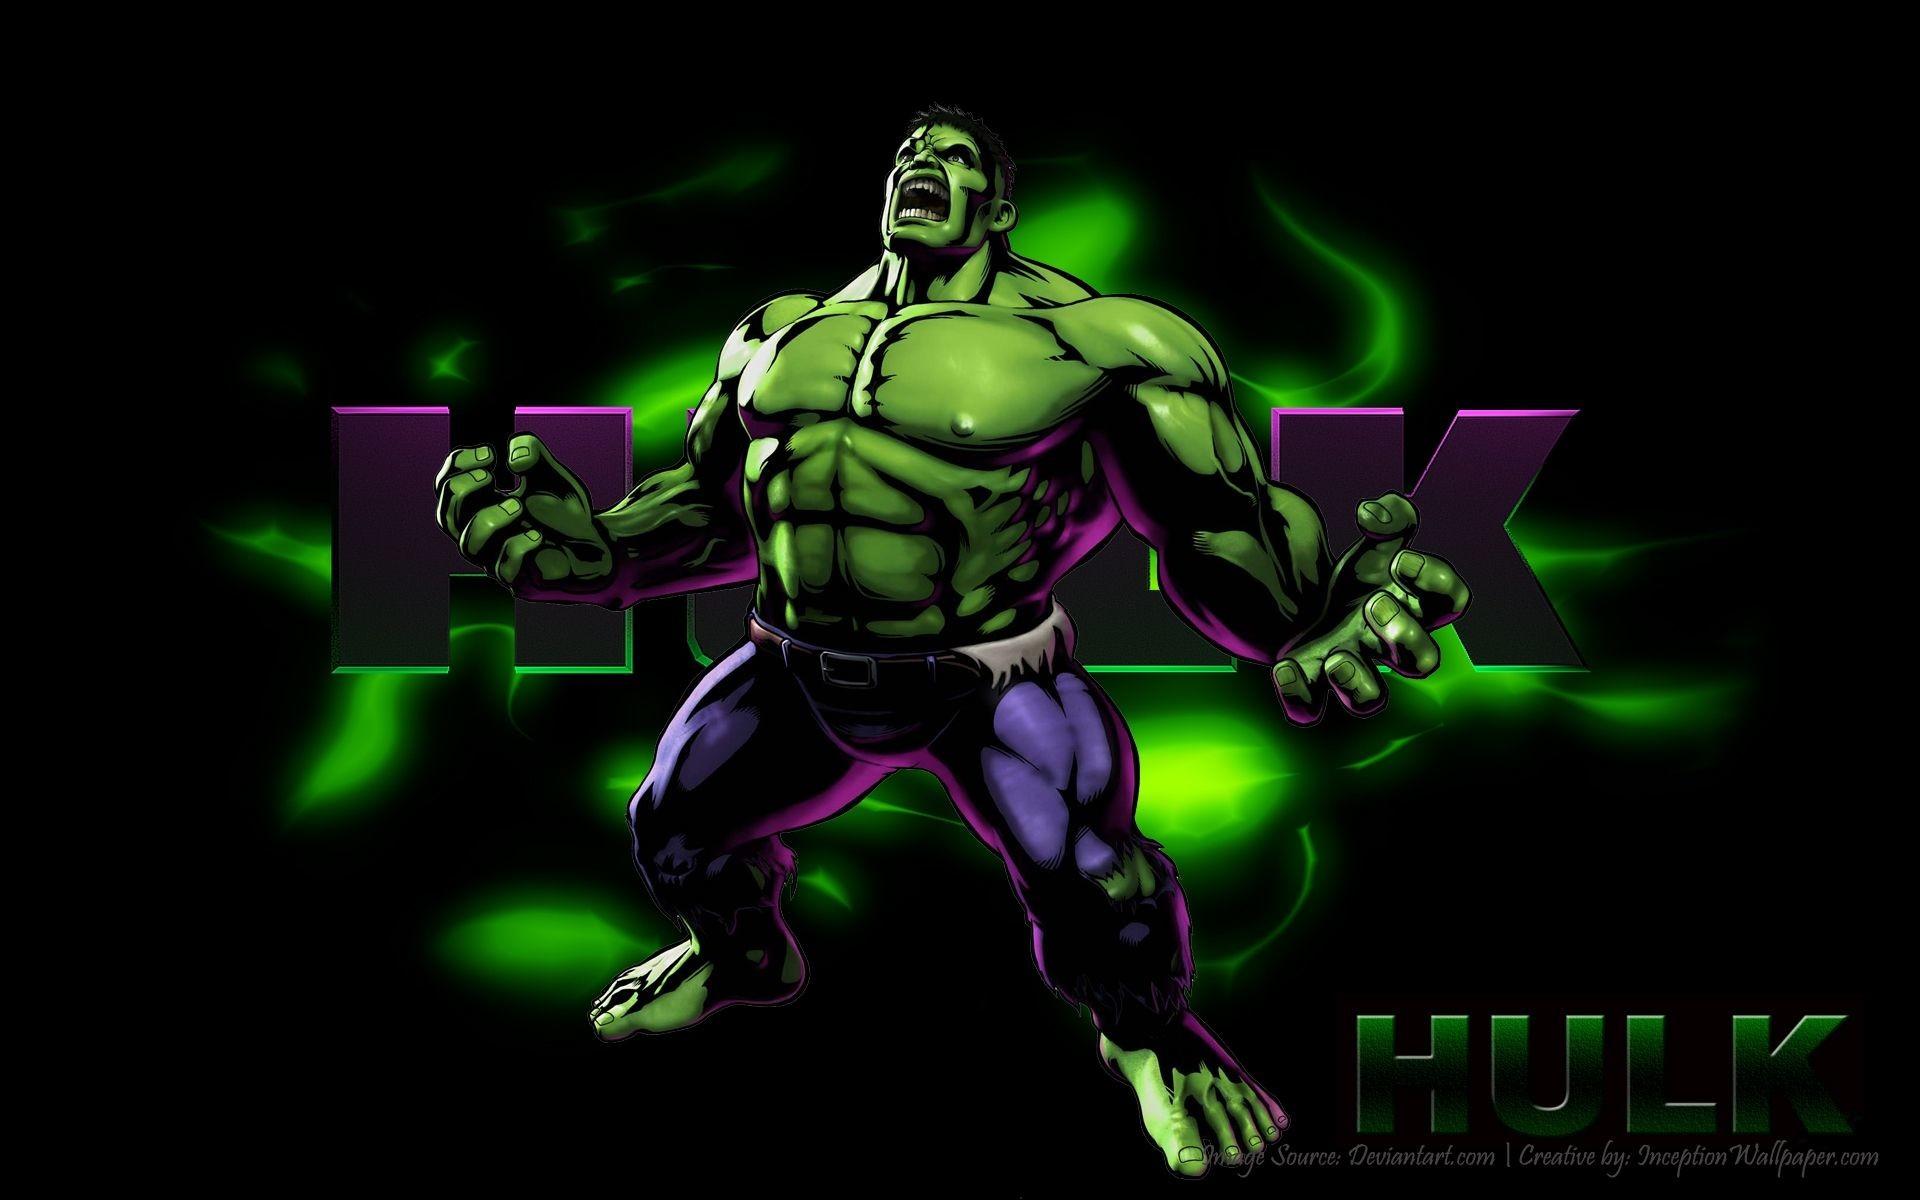 Res: 1920x1200, Download Hulk Wallpaper Full HD Wallpapers 1024×768 Wallpaper Hulk (57  Wallpapers) | Adorable Wallpapers